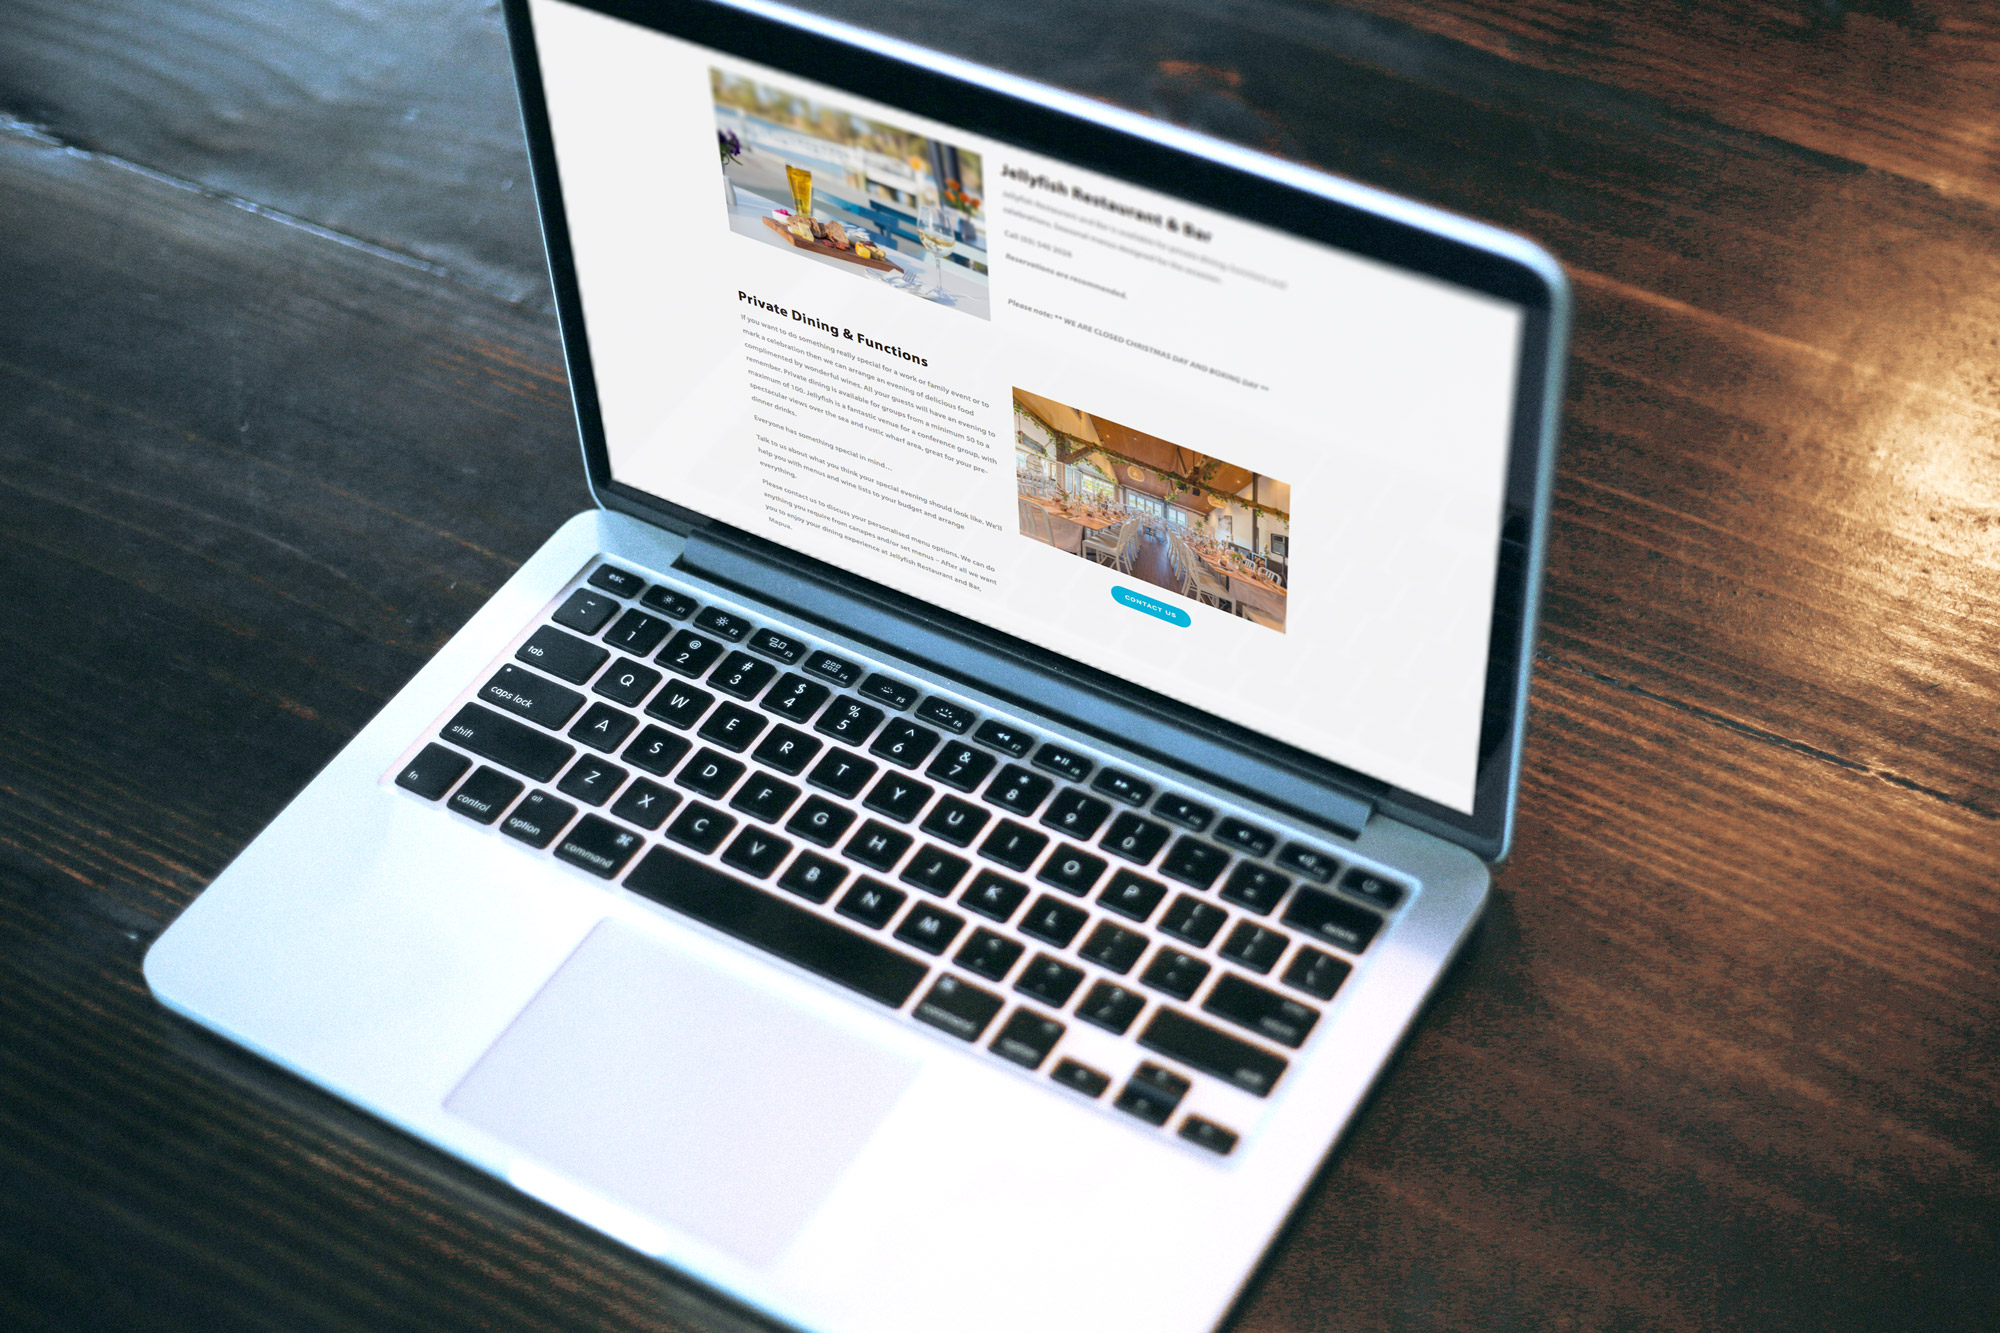 Jellyfish-Reservations-MacBook-Mockup.jpg